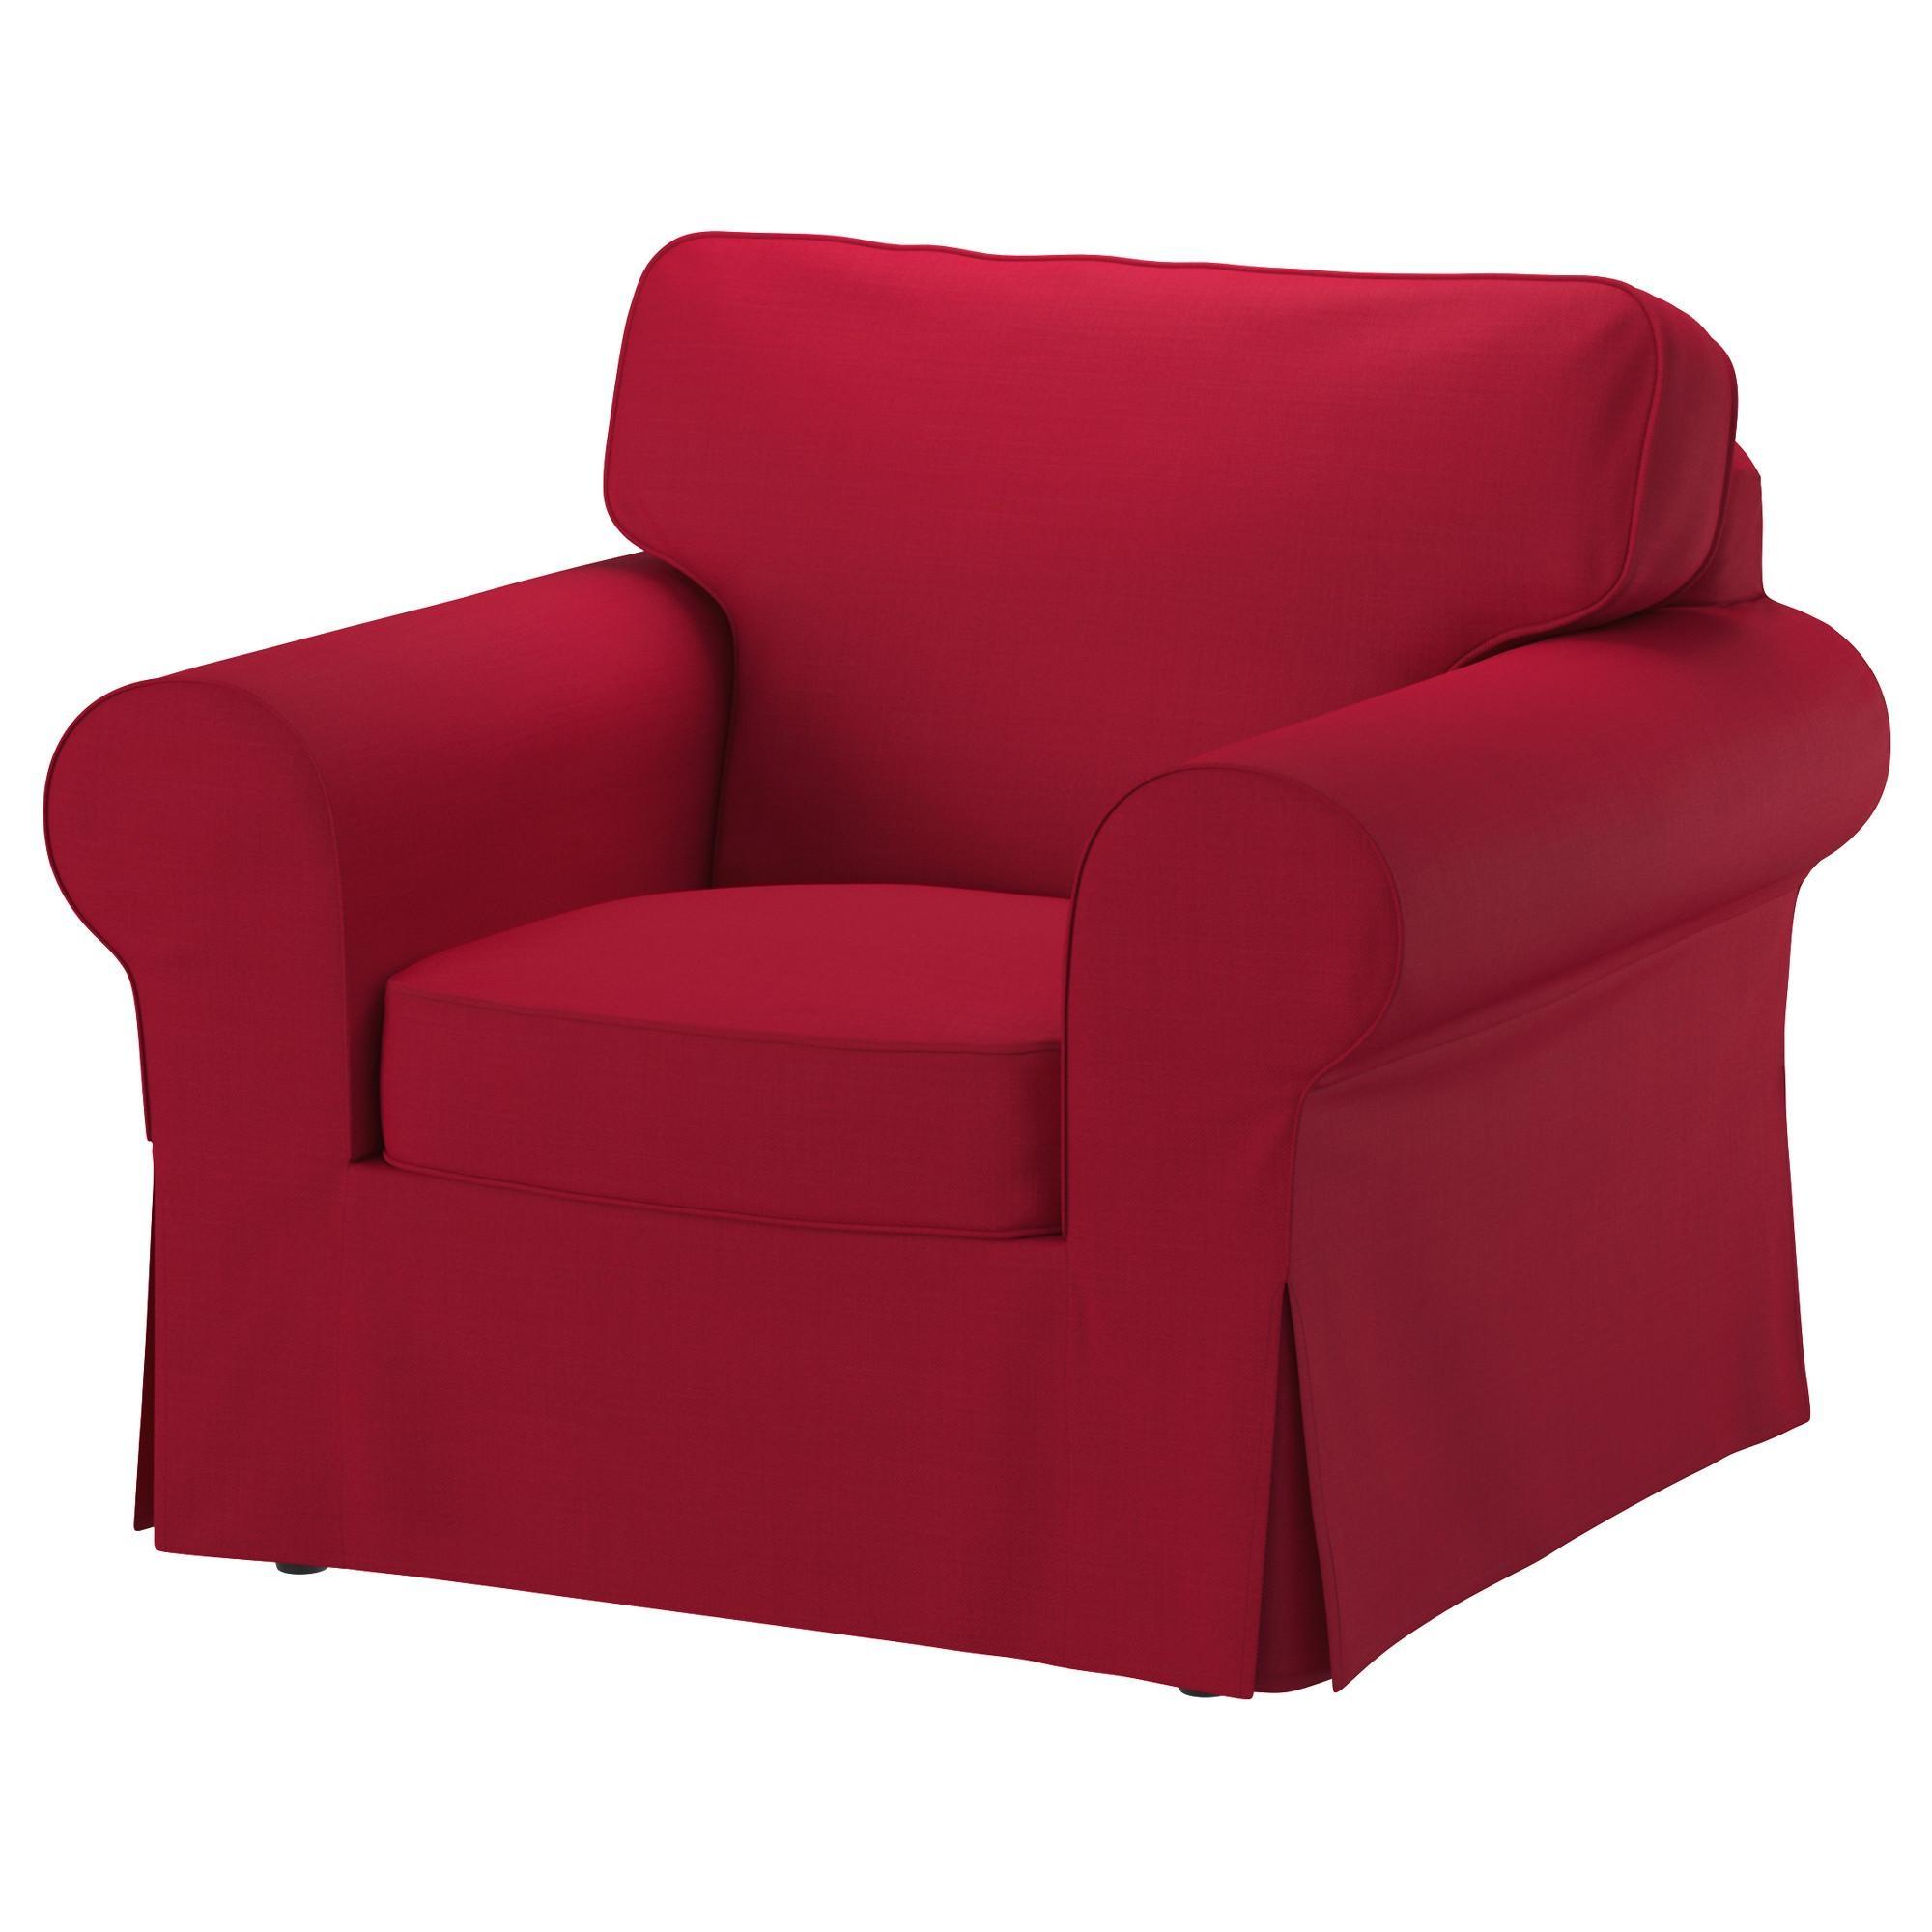 Furniture: Give Your Sofa Fresh New Look With Ikea Ektorp Chair Regarding Sofa Chairs Ikea (View 3 of 20)